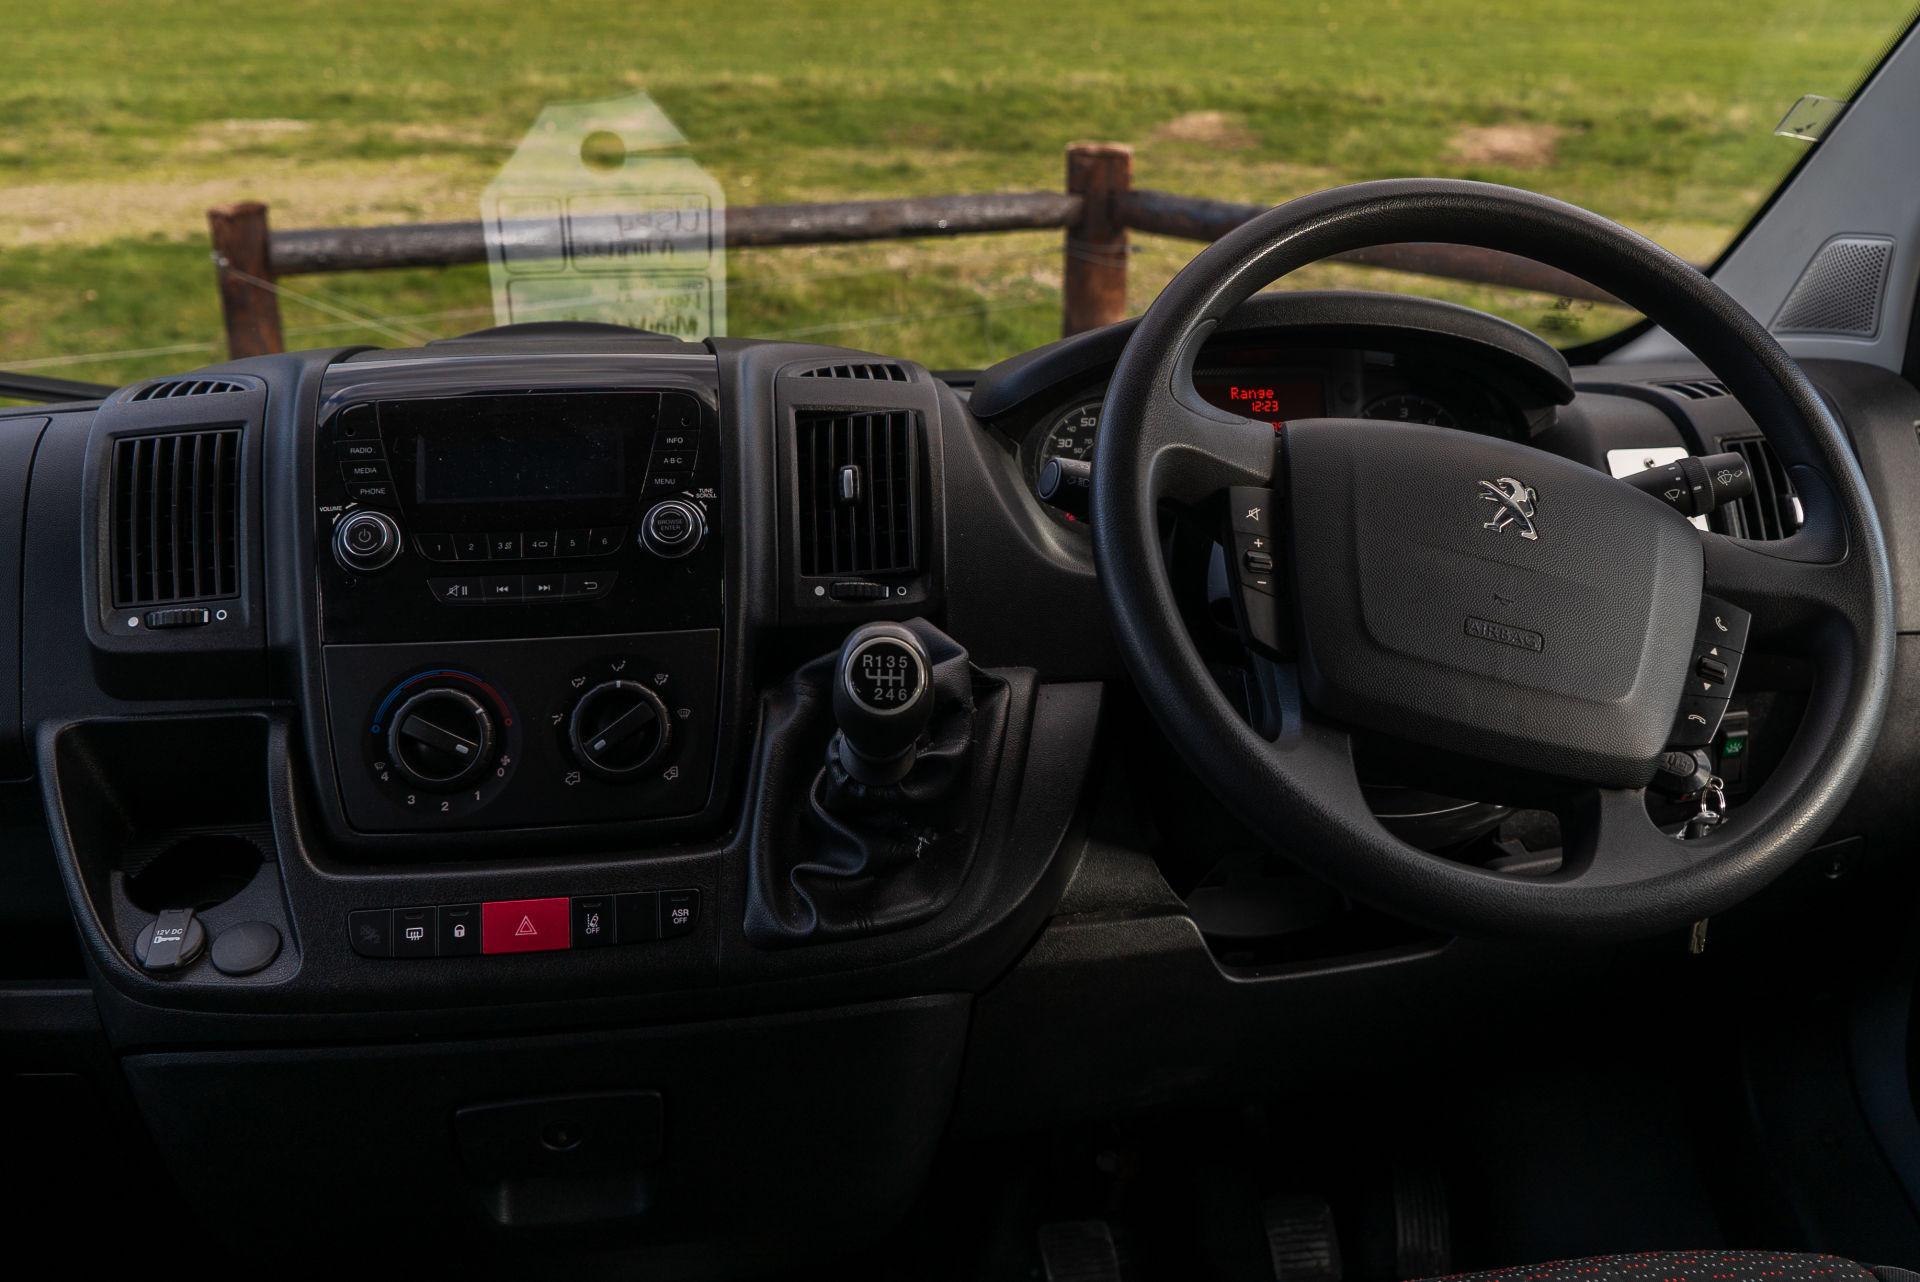 2015 Peugeot Boxer 17 Seater Accessible Minibus for Sale - Image 8